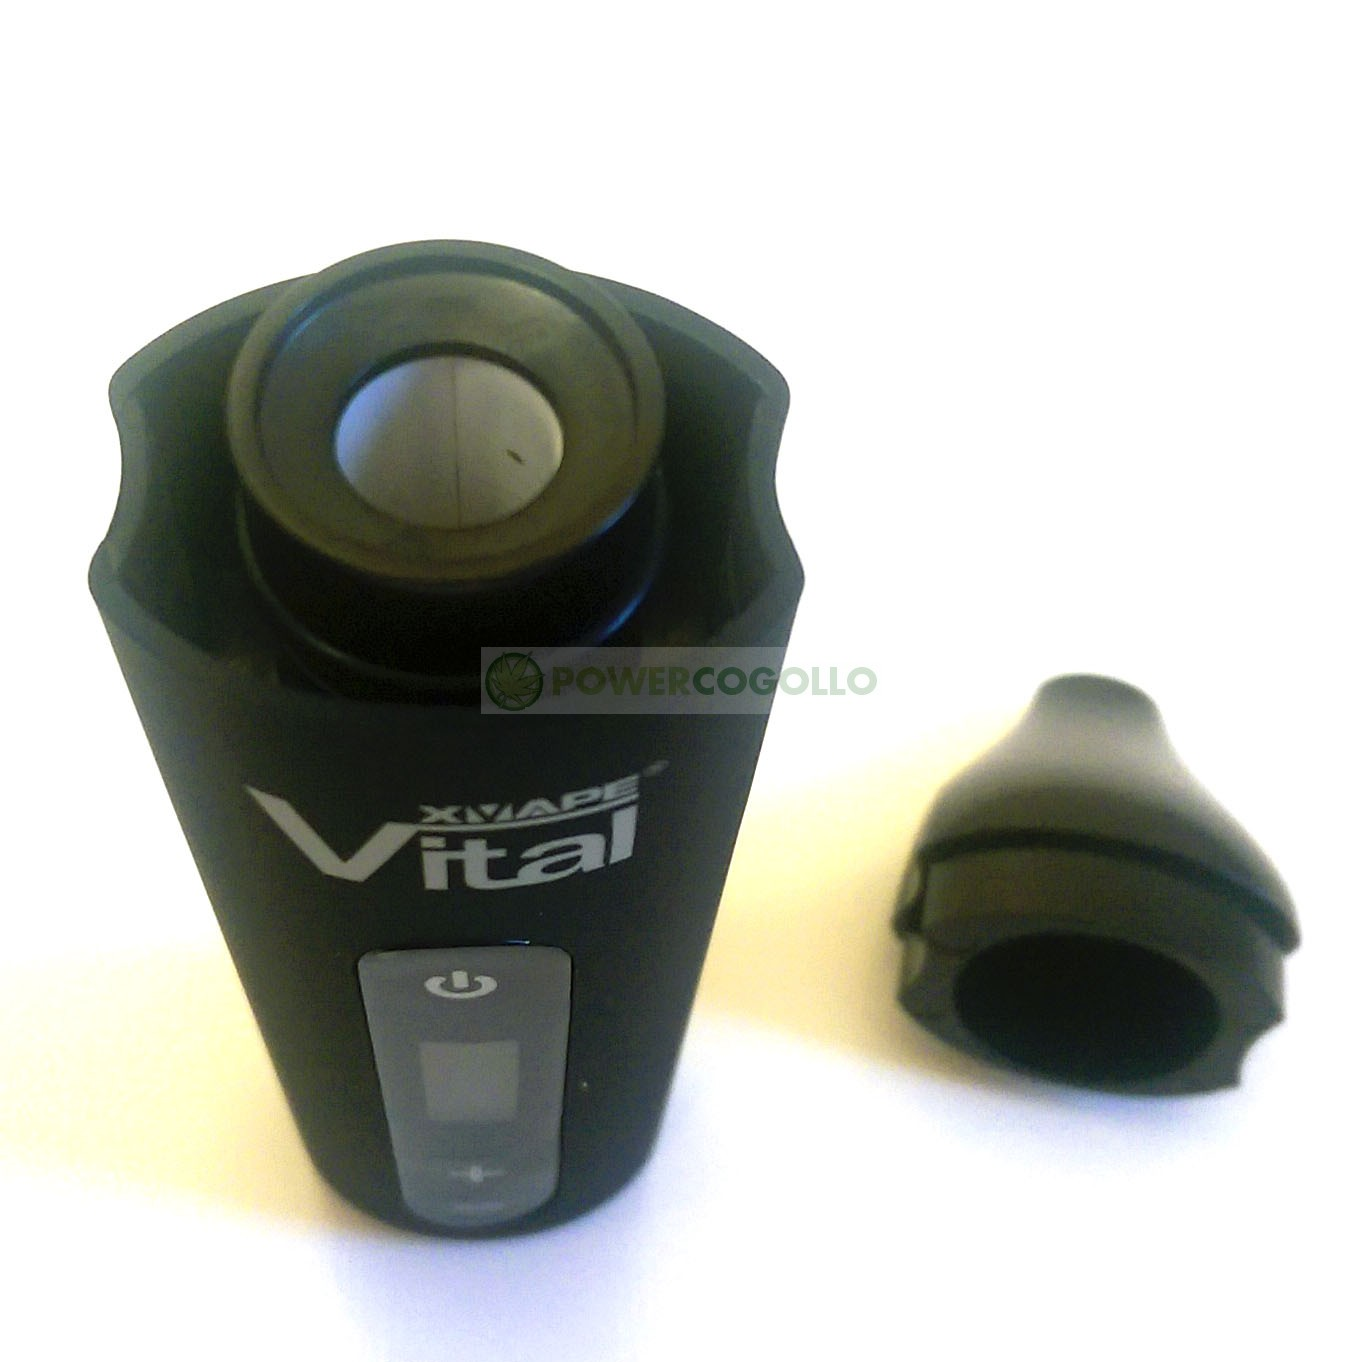 Vaporizador Vital (ºCelsius) Portátil Barato 5